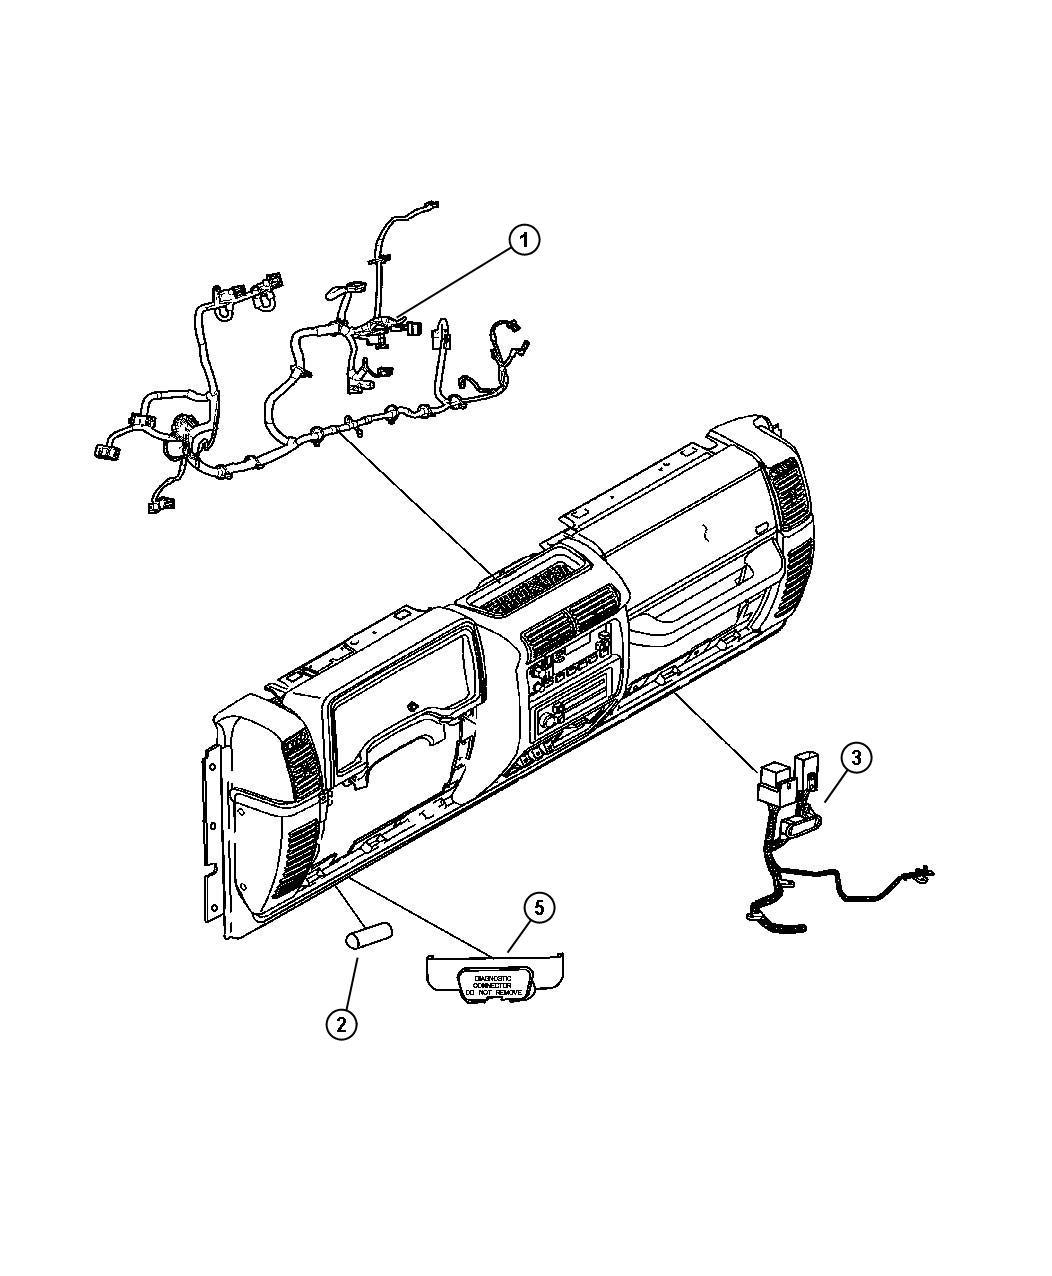 Jeep Wrangler Wiring Radio Jumper Sirius Satellite